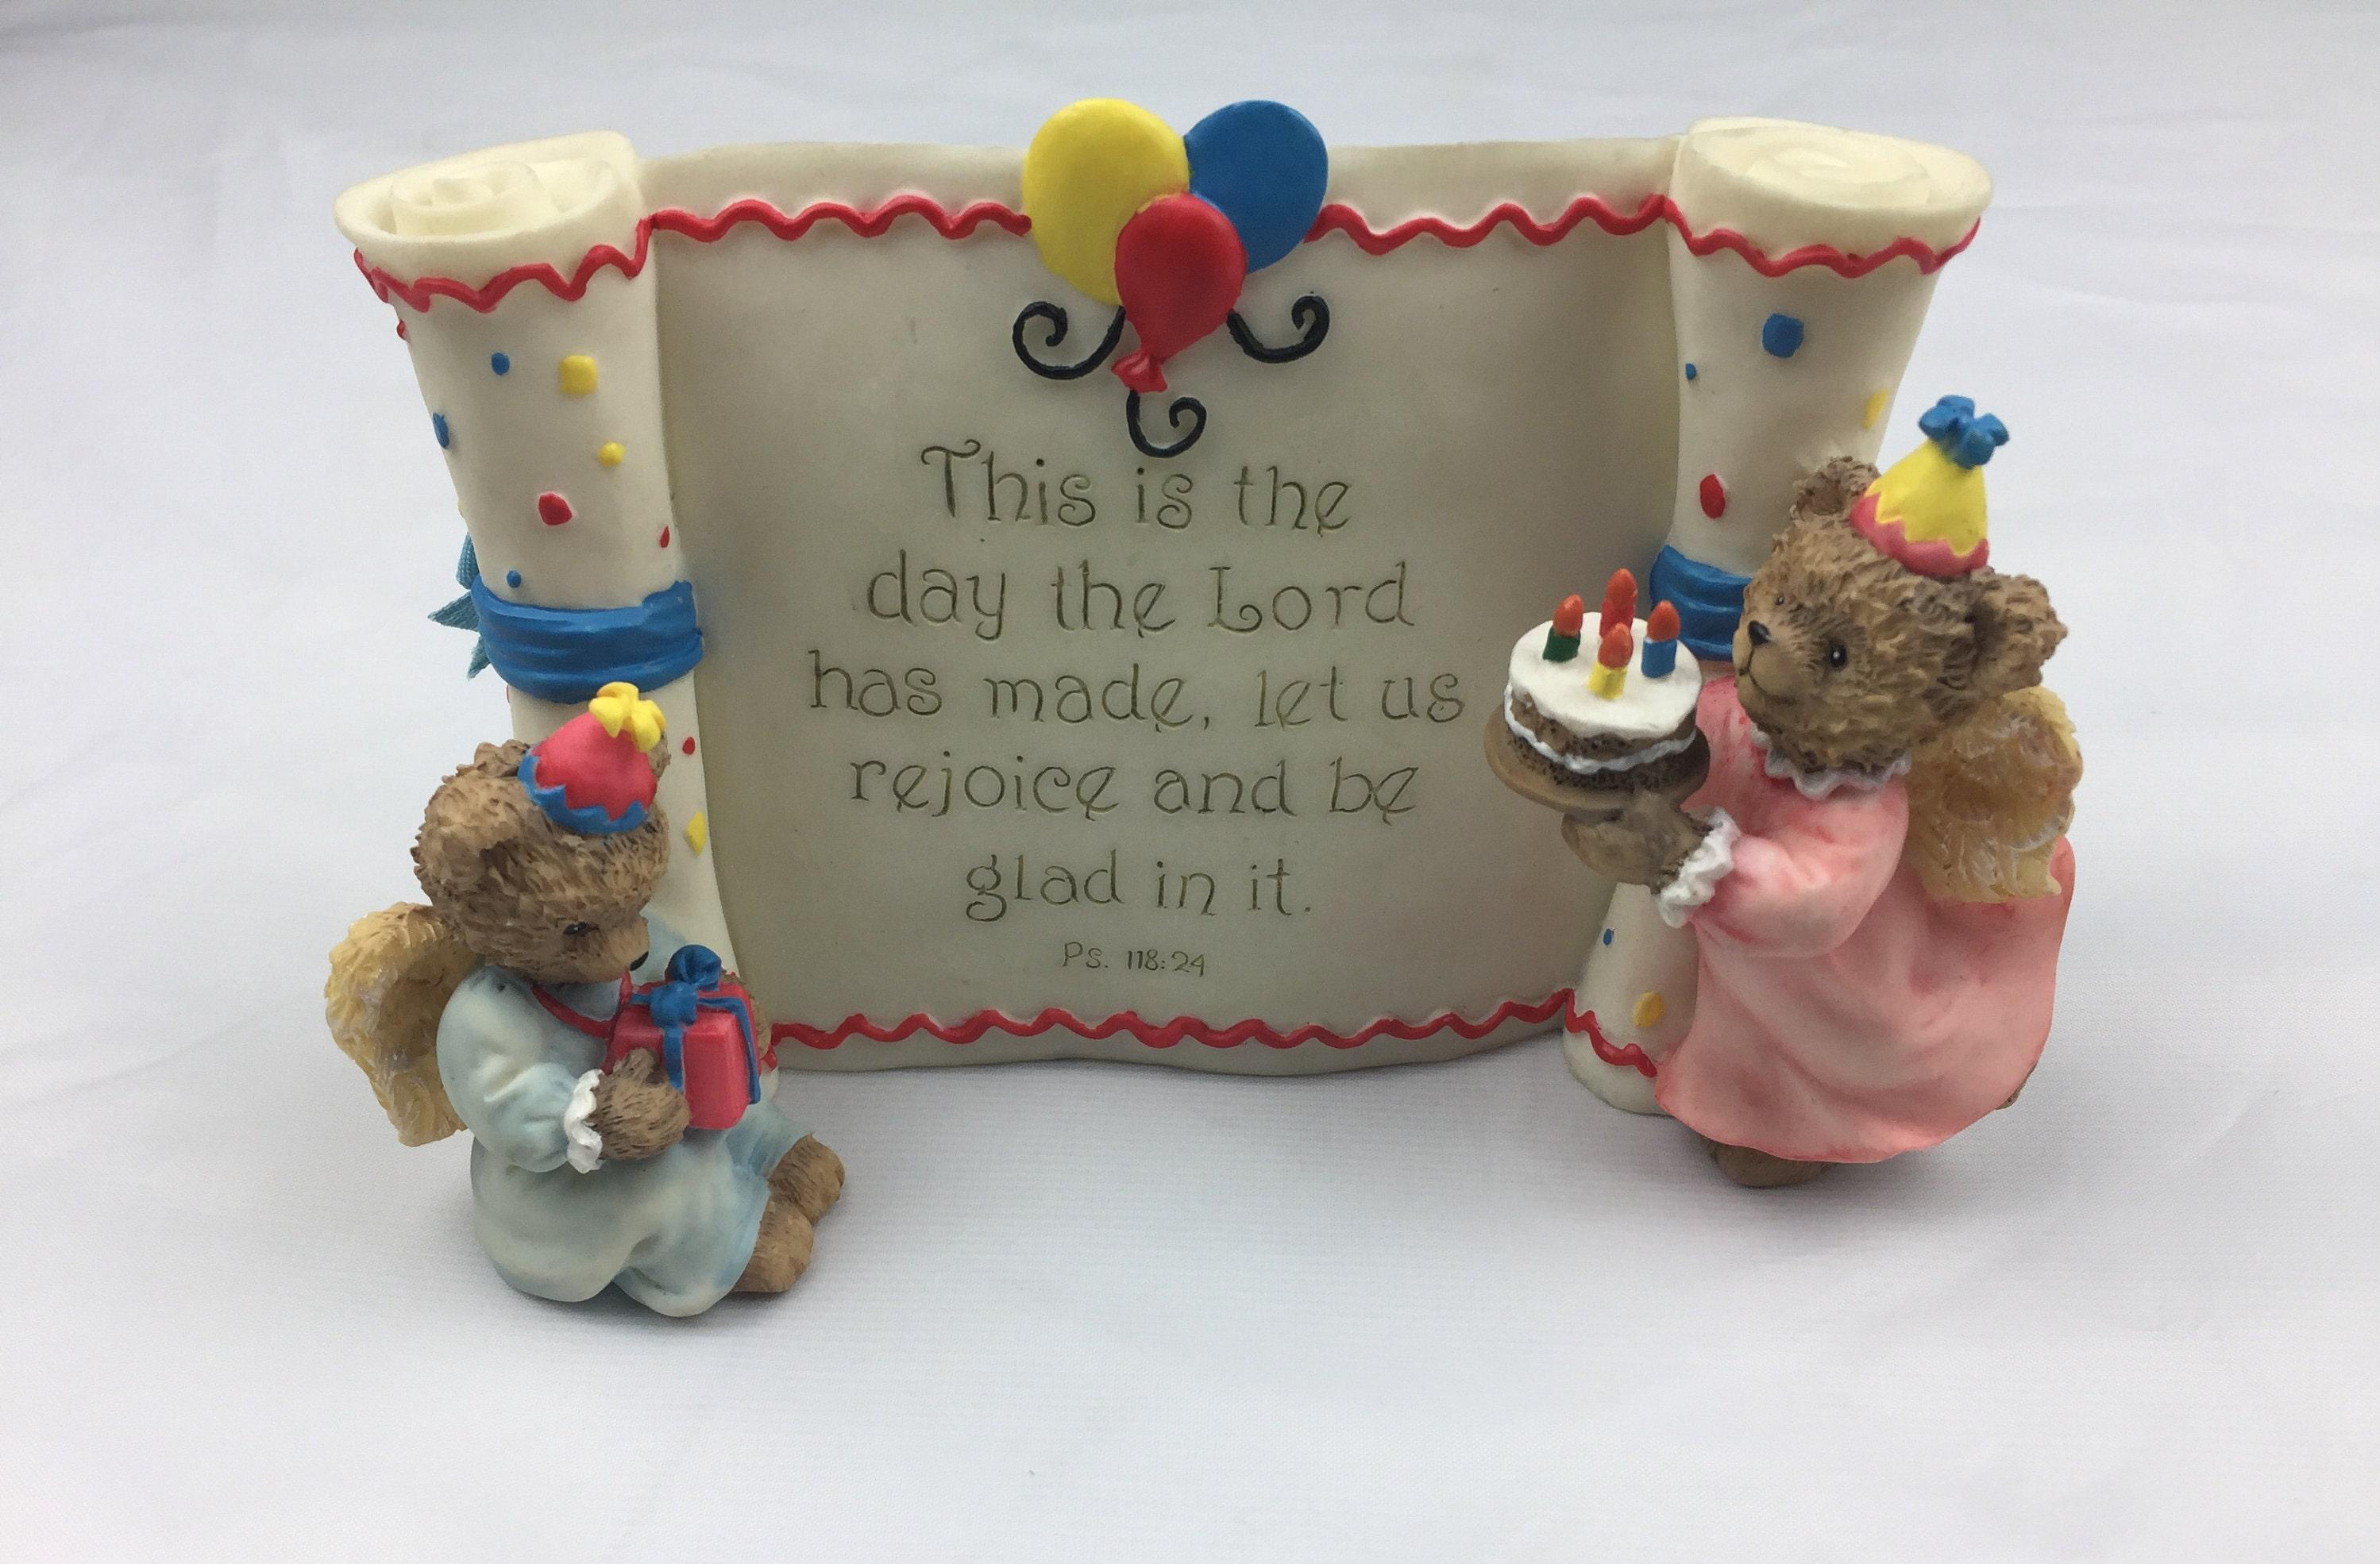 Happy Birthday Religious Statue With Bears And Birthday Cake